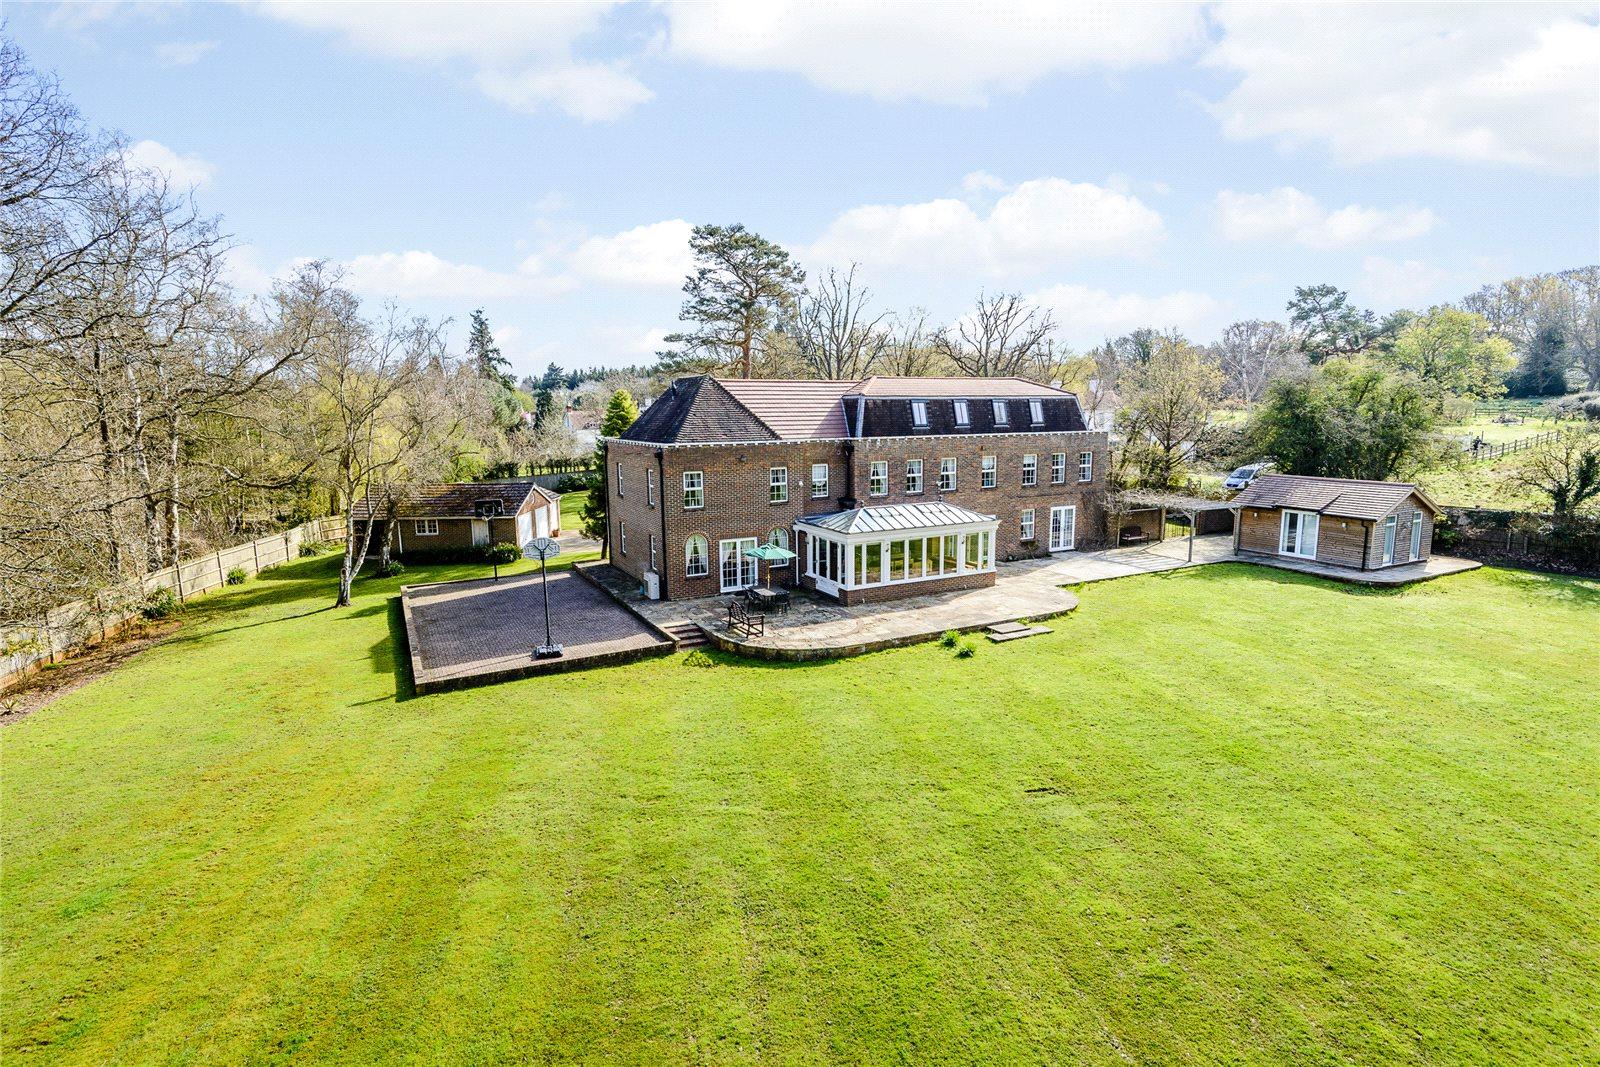 Casa para uma família para Venda às Coombe Lane, Ascot, Berkshire, SL5 Ascot, Inglaterra